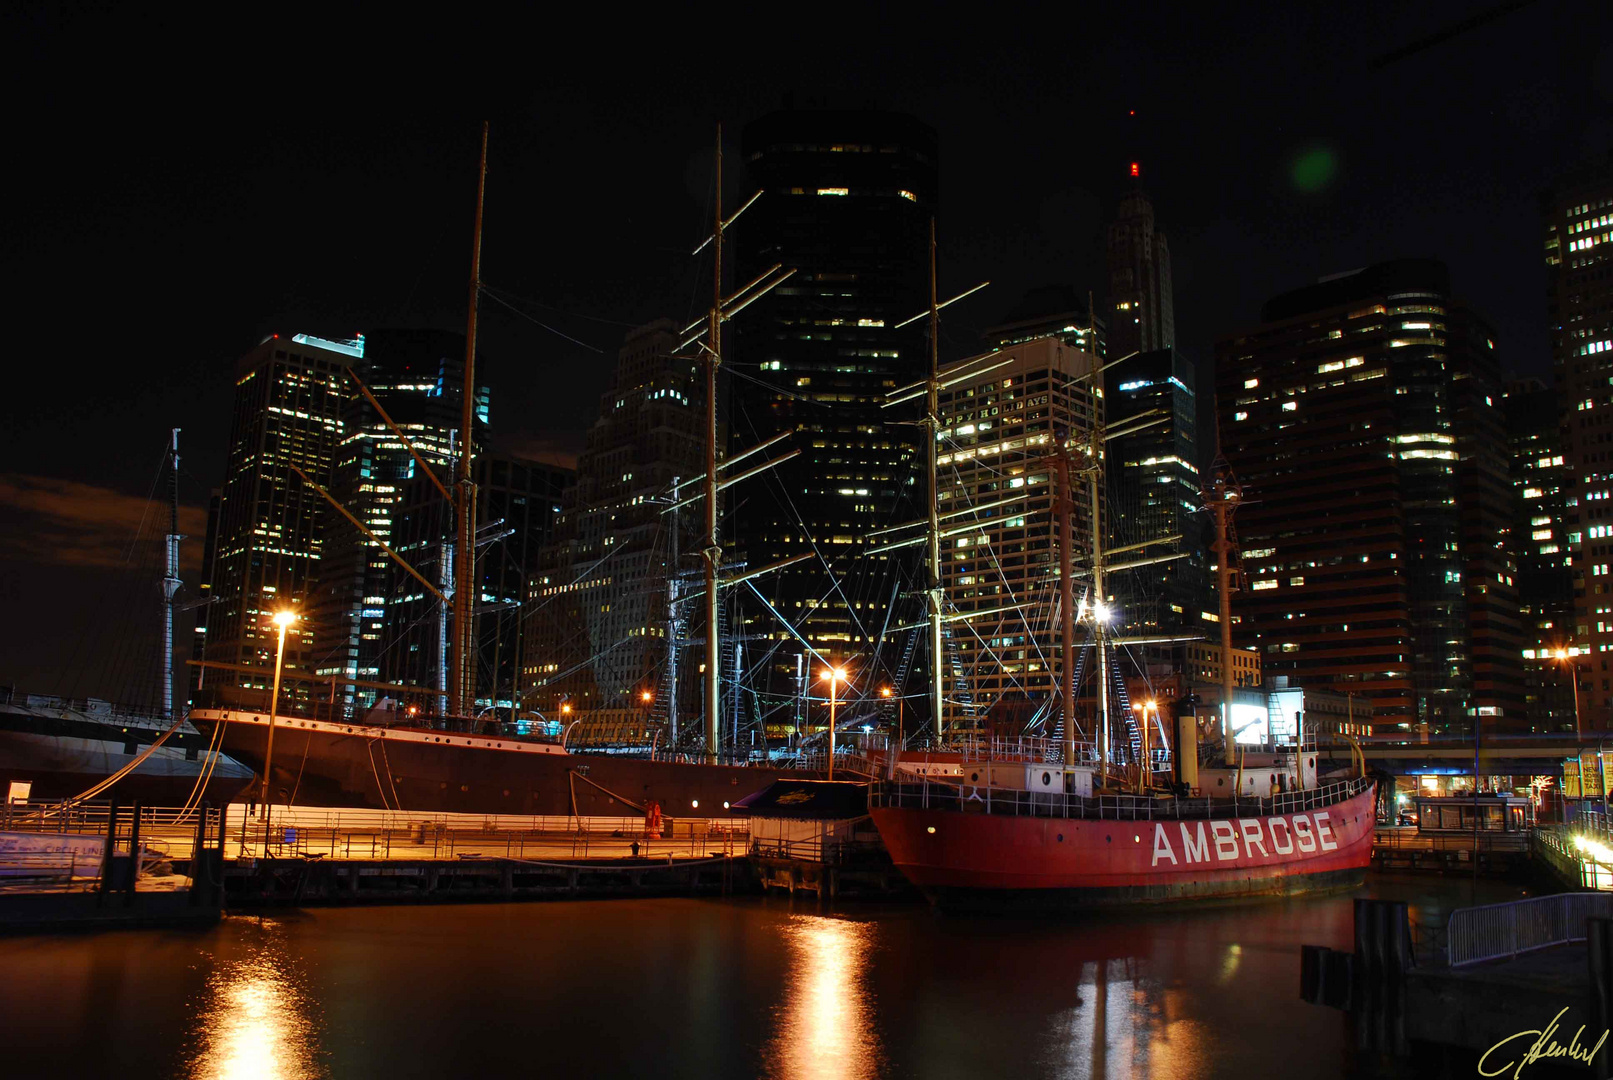 Schiff Ambrose